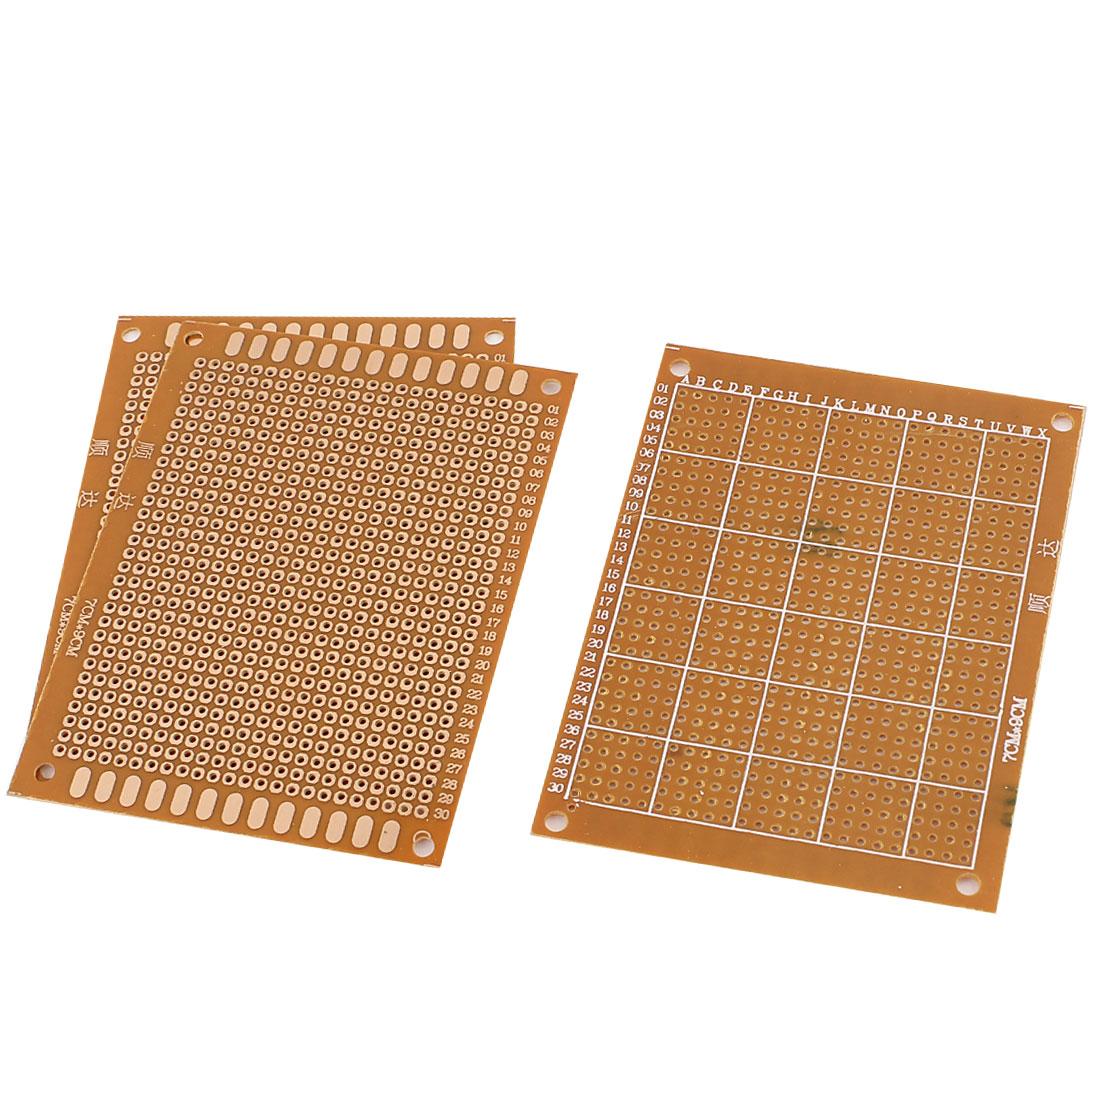 3 Pcs Universal Single Side DIY Prototype PCB Board 7cmx9cm